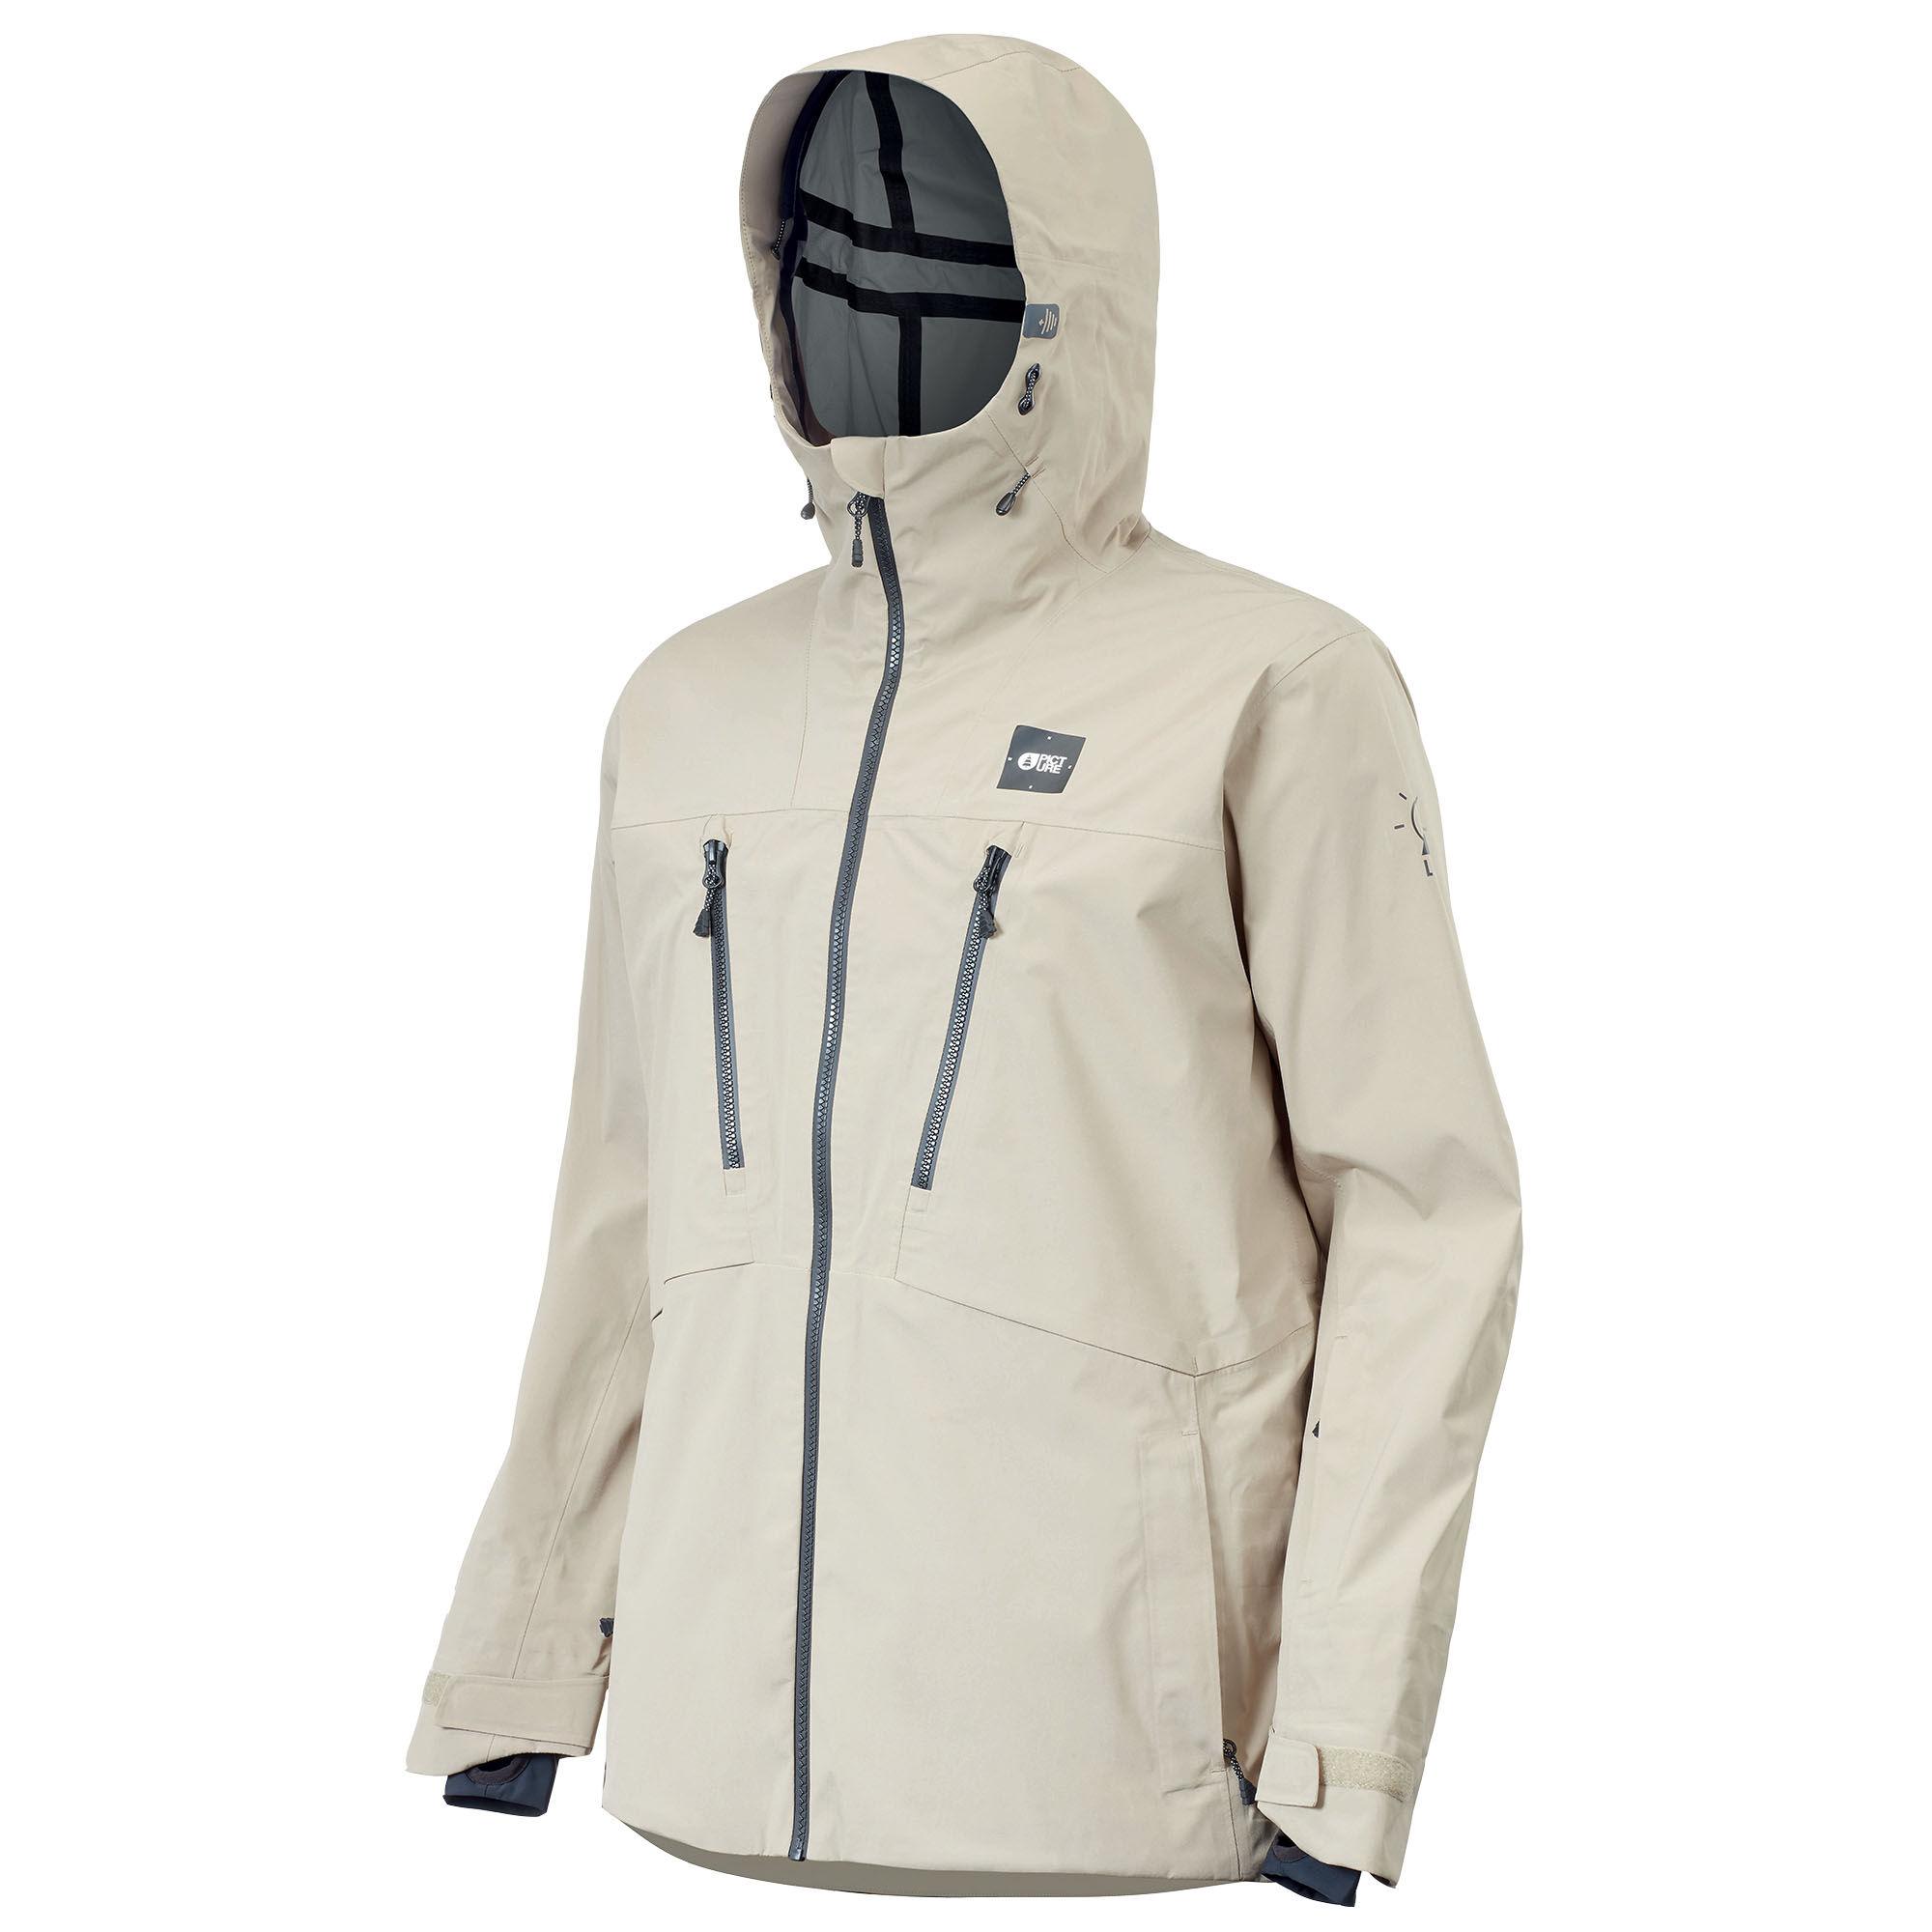 Picture Organic Clothing Men's Demain Snow Jacket  - Stone - Size: Medium